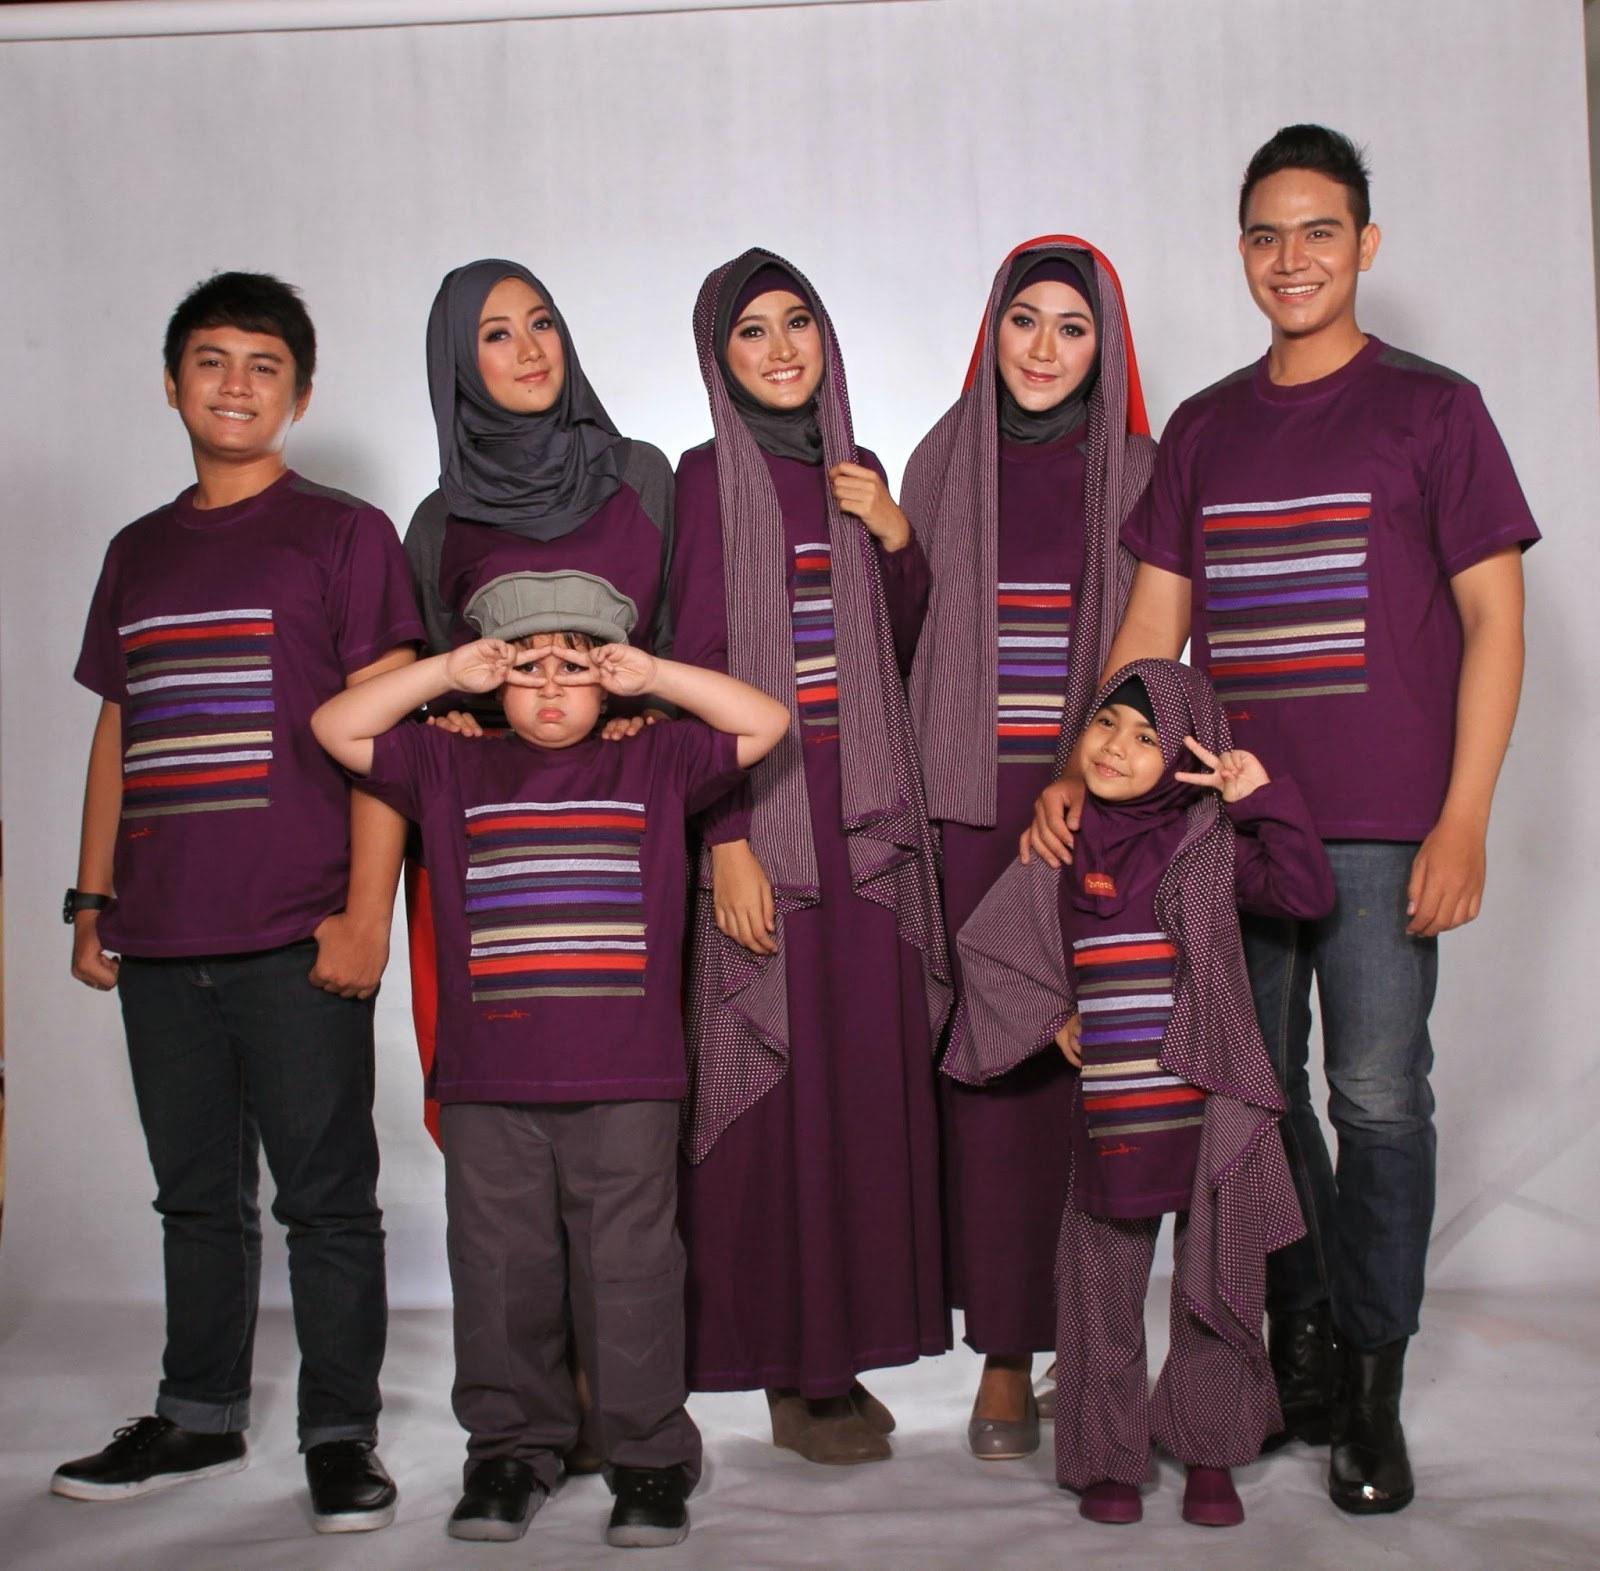 Inspirasi Model Baju Lebaran Untuk Keluarga Qwdq Model Baju Keluarga Untuk Hari Raya Lebaran 2018